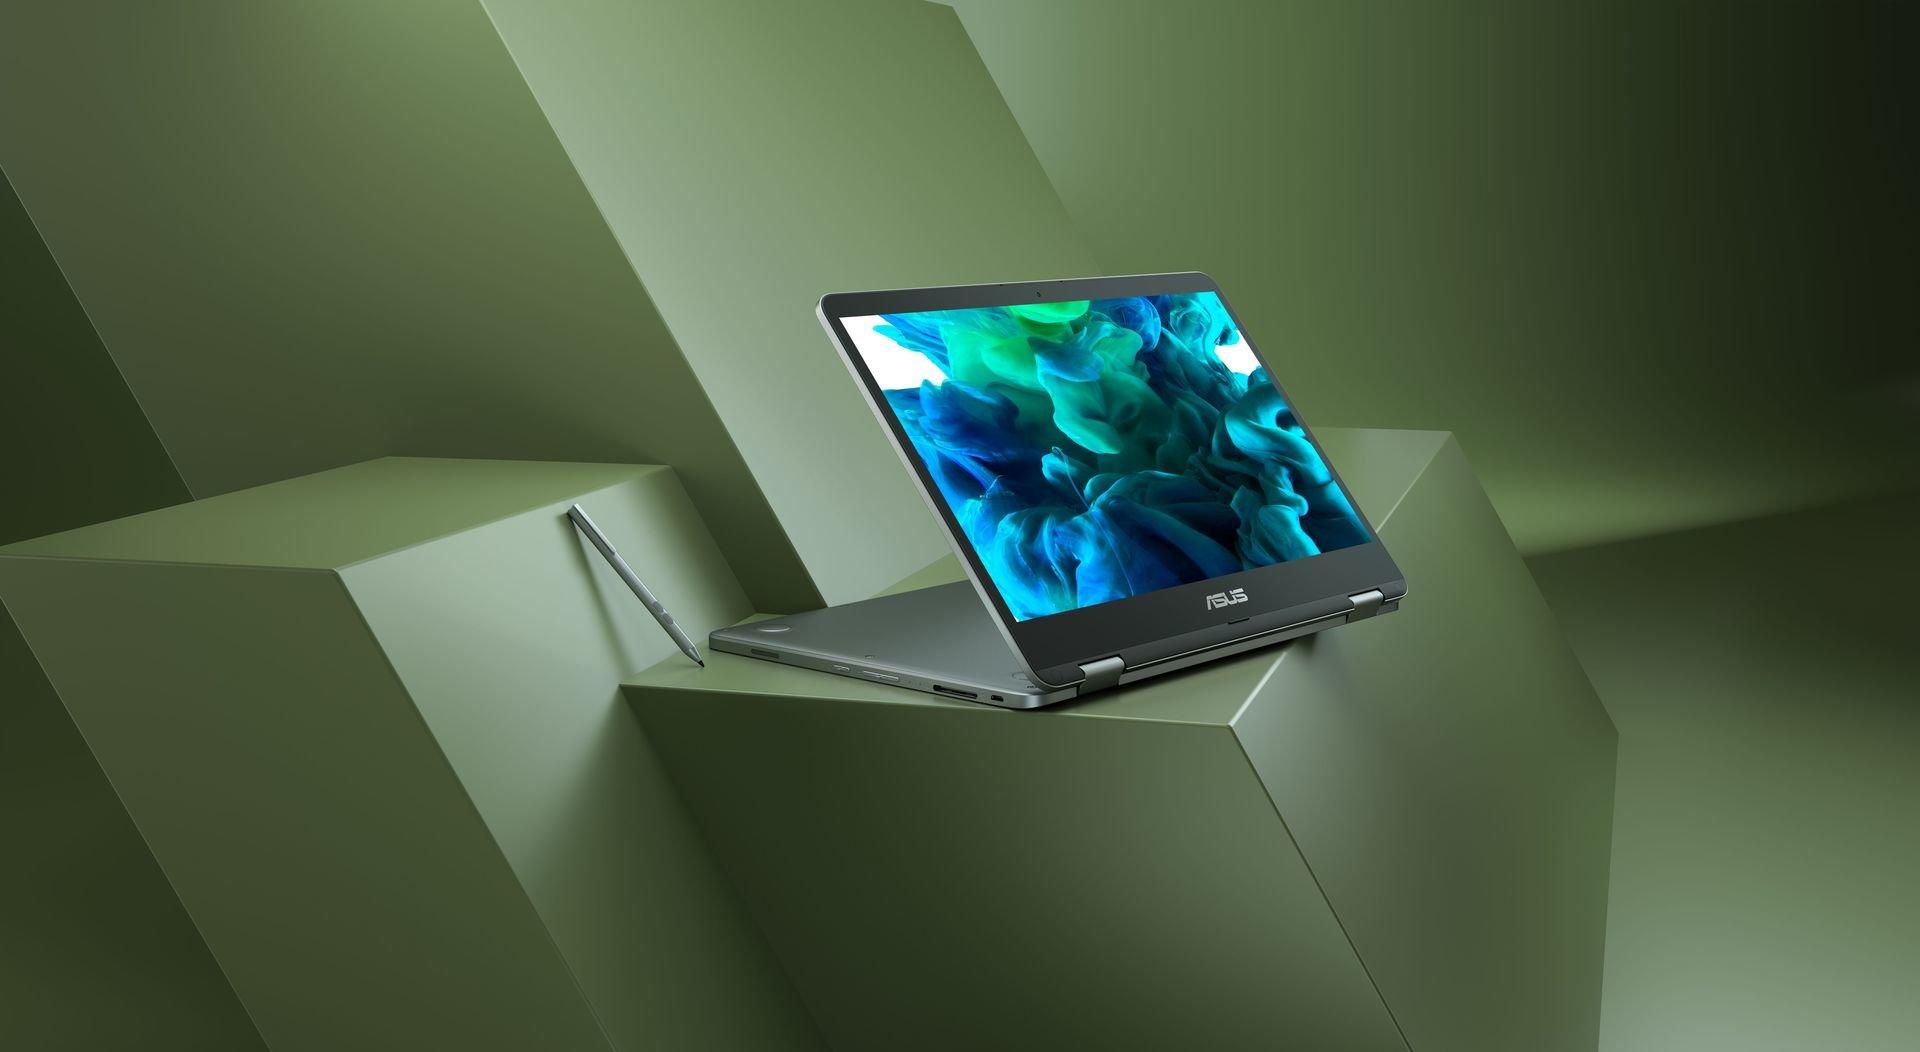 Idealnie dobrana para - ASUS VivoBook Flip 14 (TP401) i rysik ASUS Pen